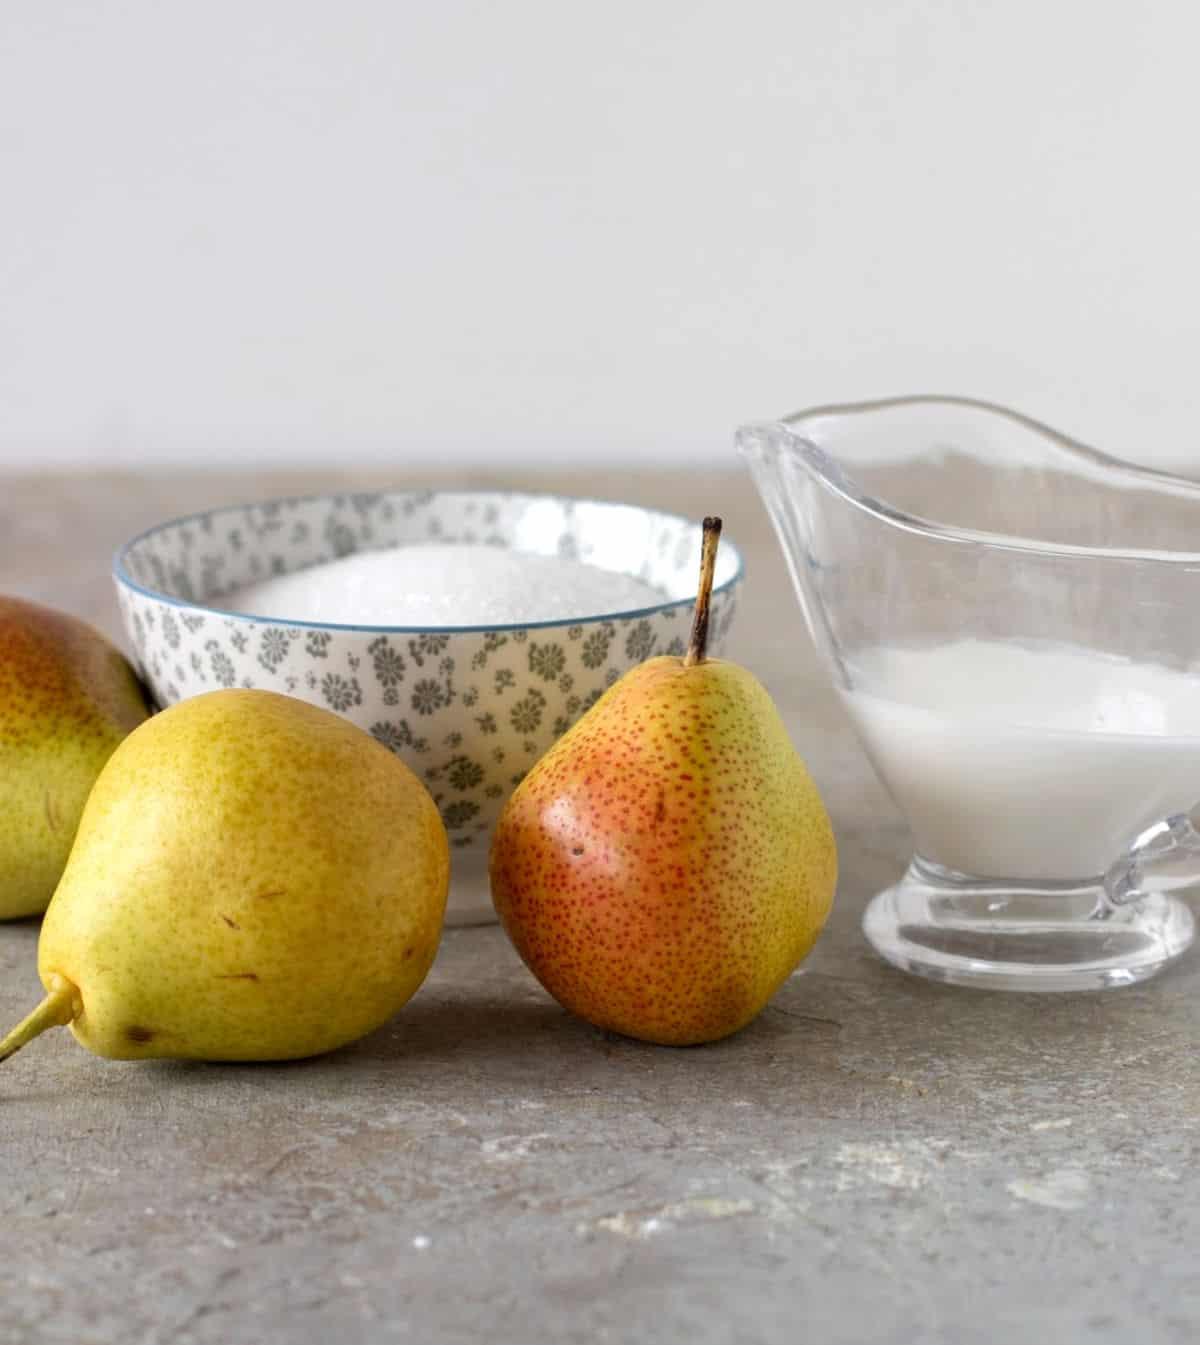 Whole pears, grey bowl with sugar, glass jar, grey background